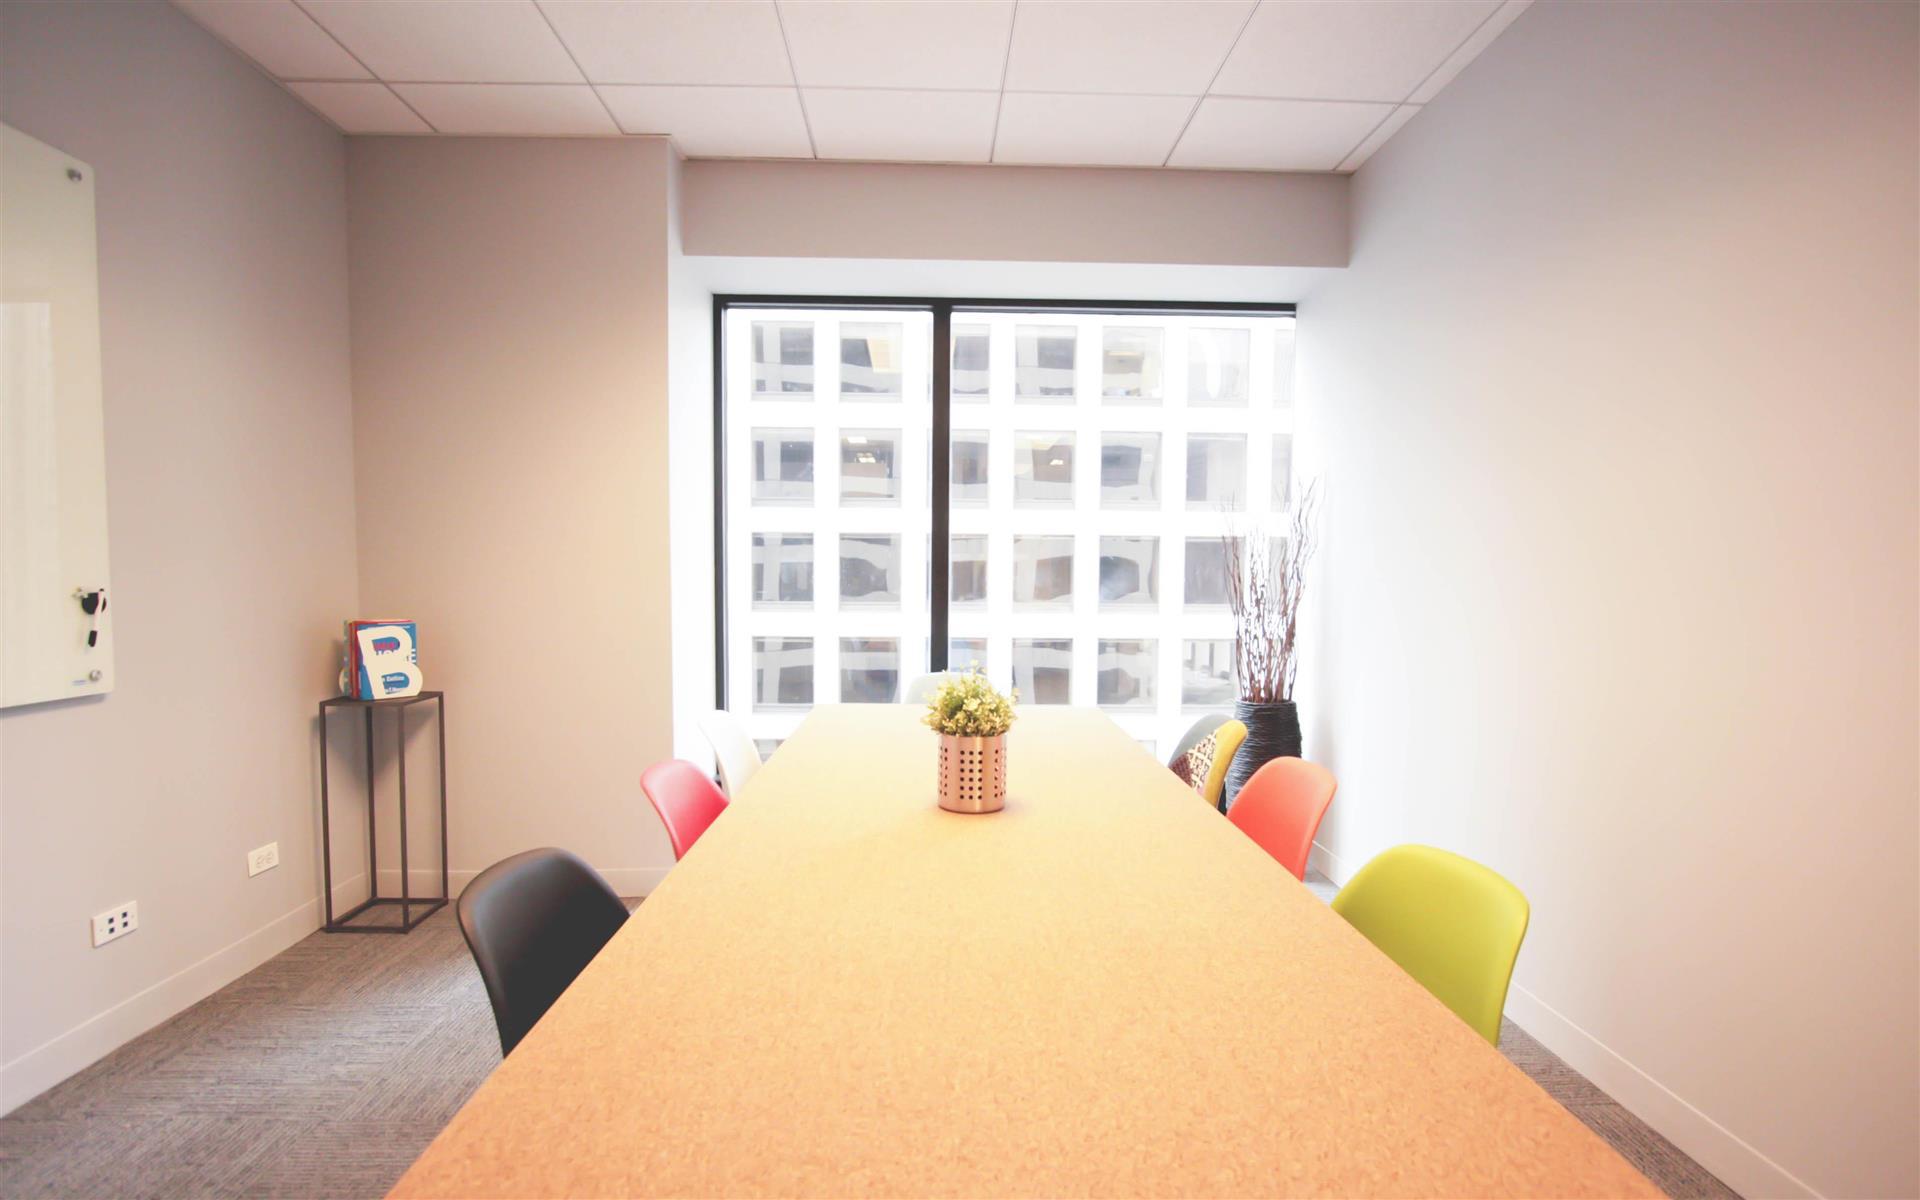 BeOffice | URBAN WORKSPACES - Monthly Large Focus Room